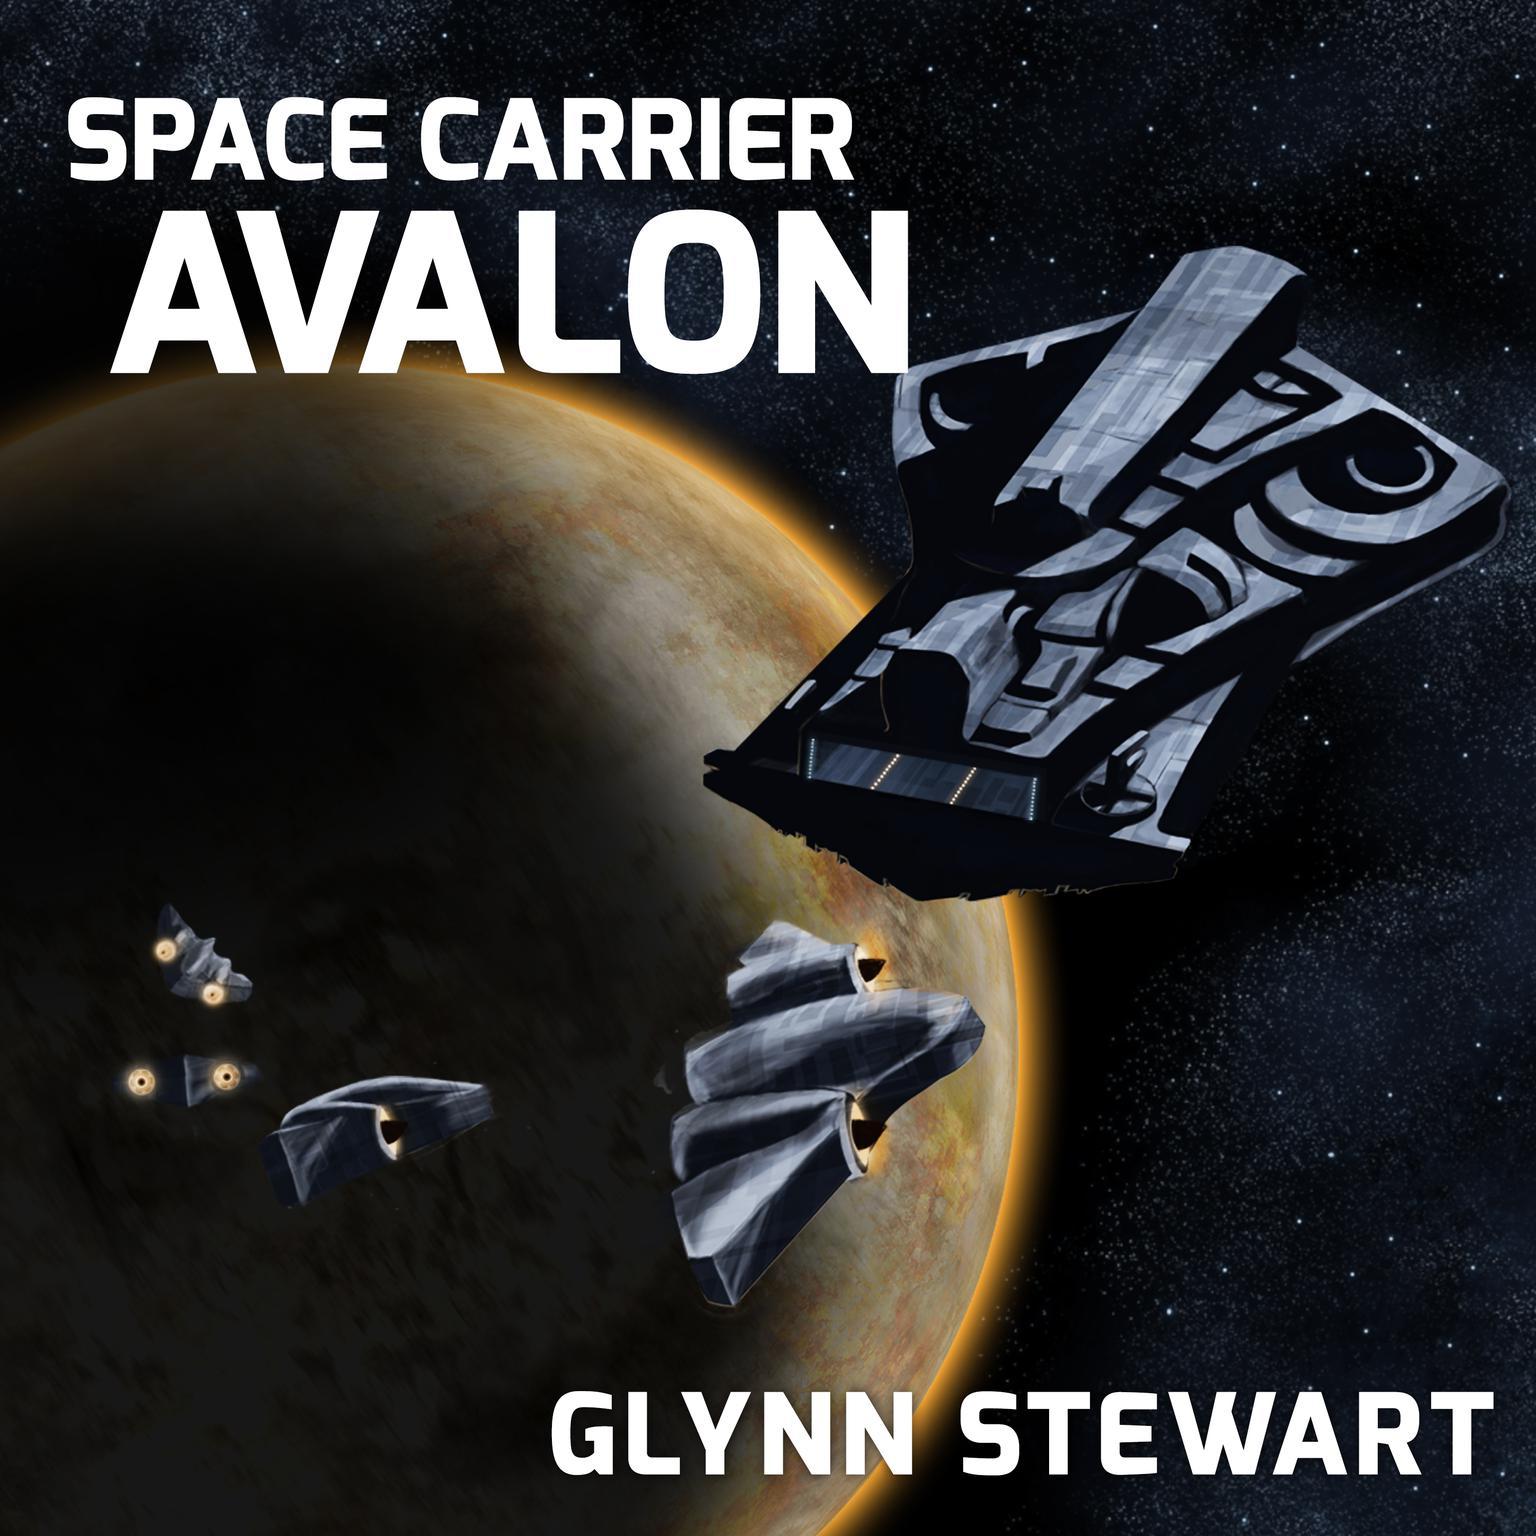 Space Carrier Avalon Audiobook, by Glynn Stewart